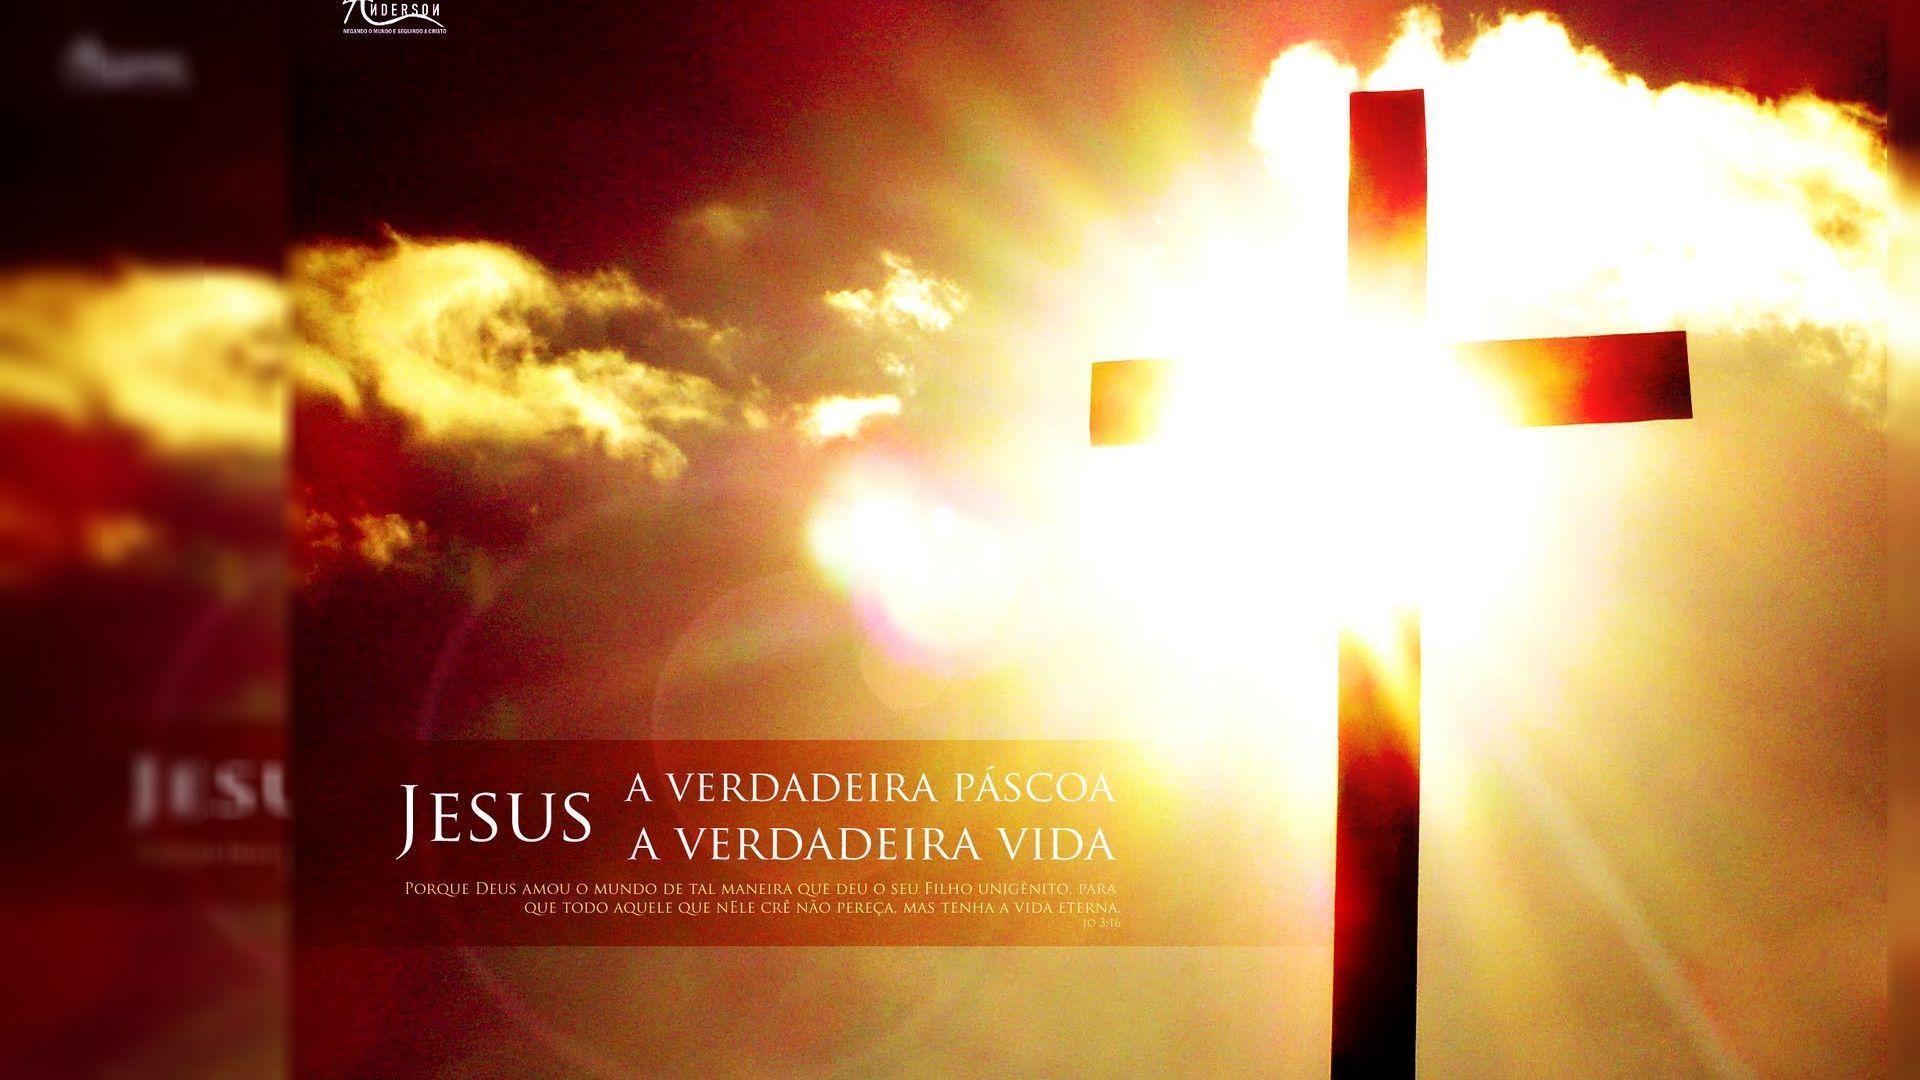 Download Cross Jesus Wallpaper | 100% High Quality Widescreen ...